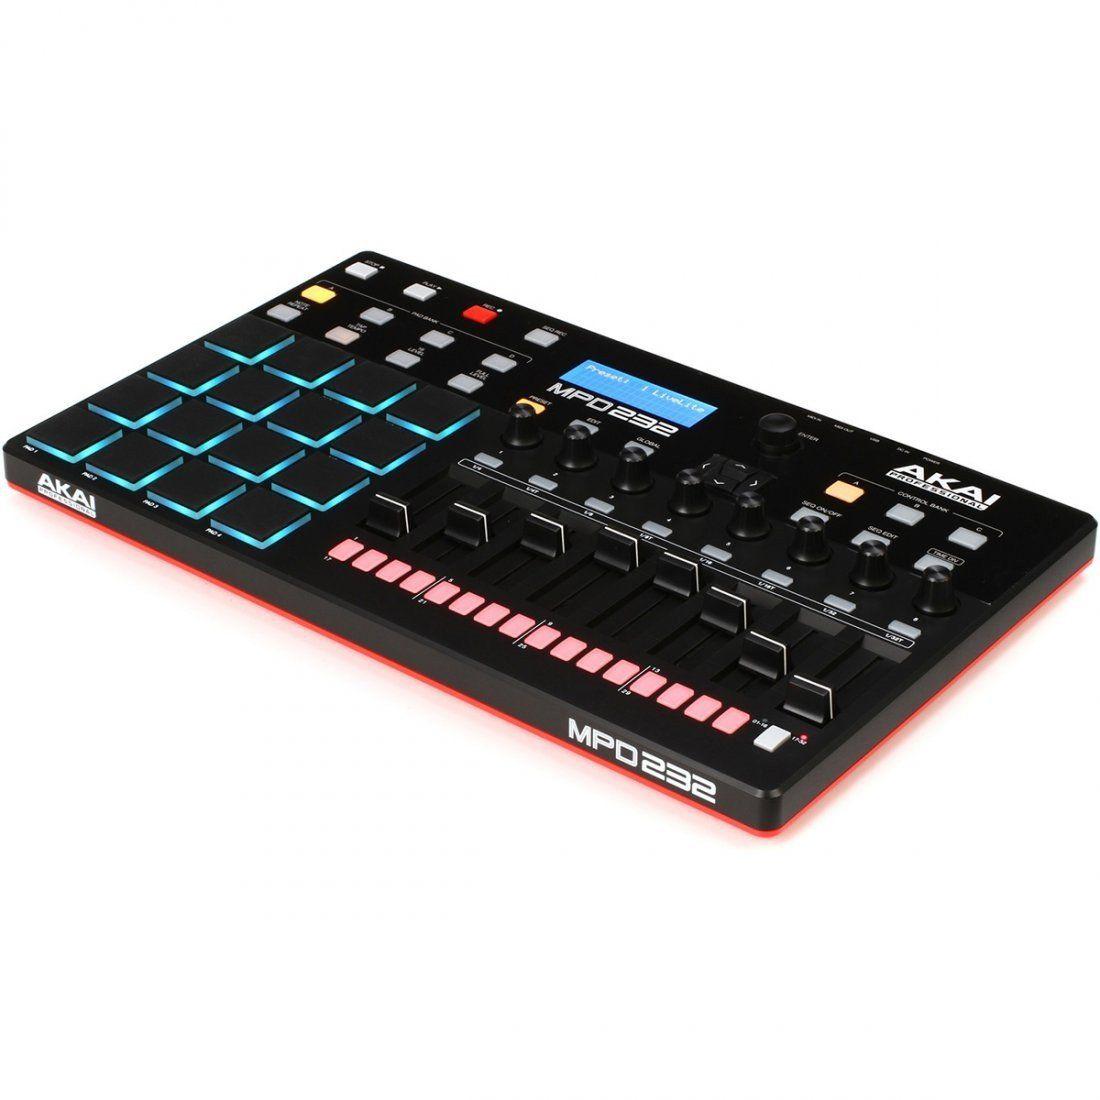 Akai MPD232 Controladora MPD-232 Sampler 16-Pads Sequenciador 32-Steps Beatmaker